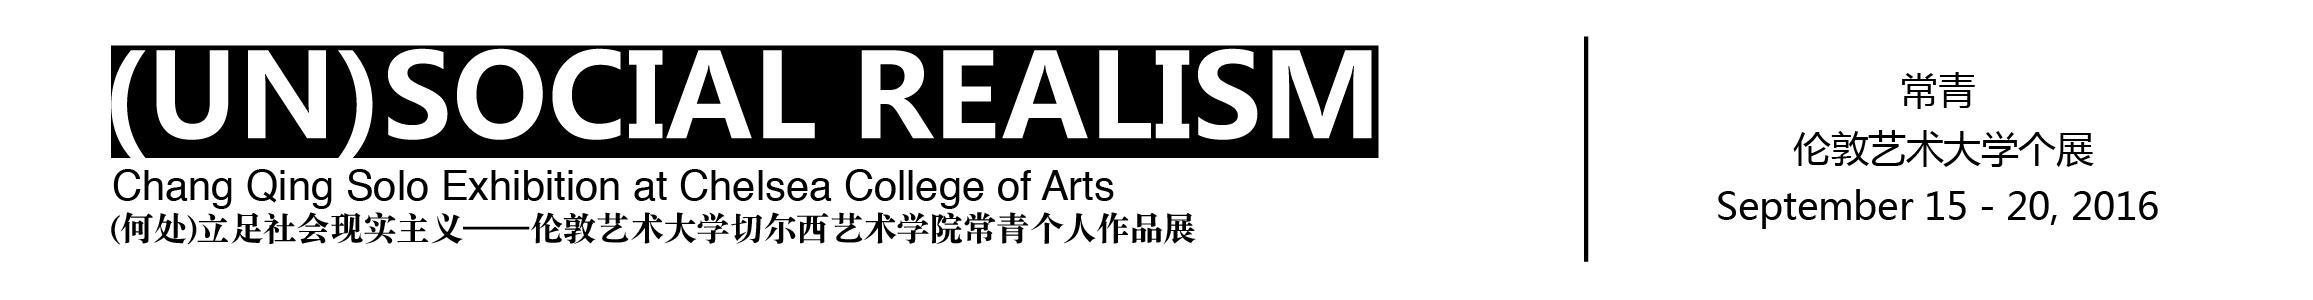 (un)social realism Chang Qing